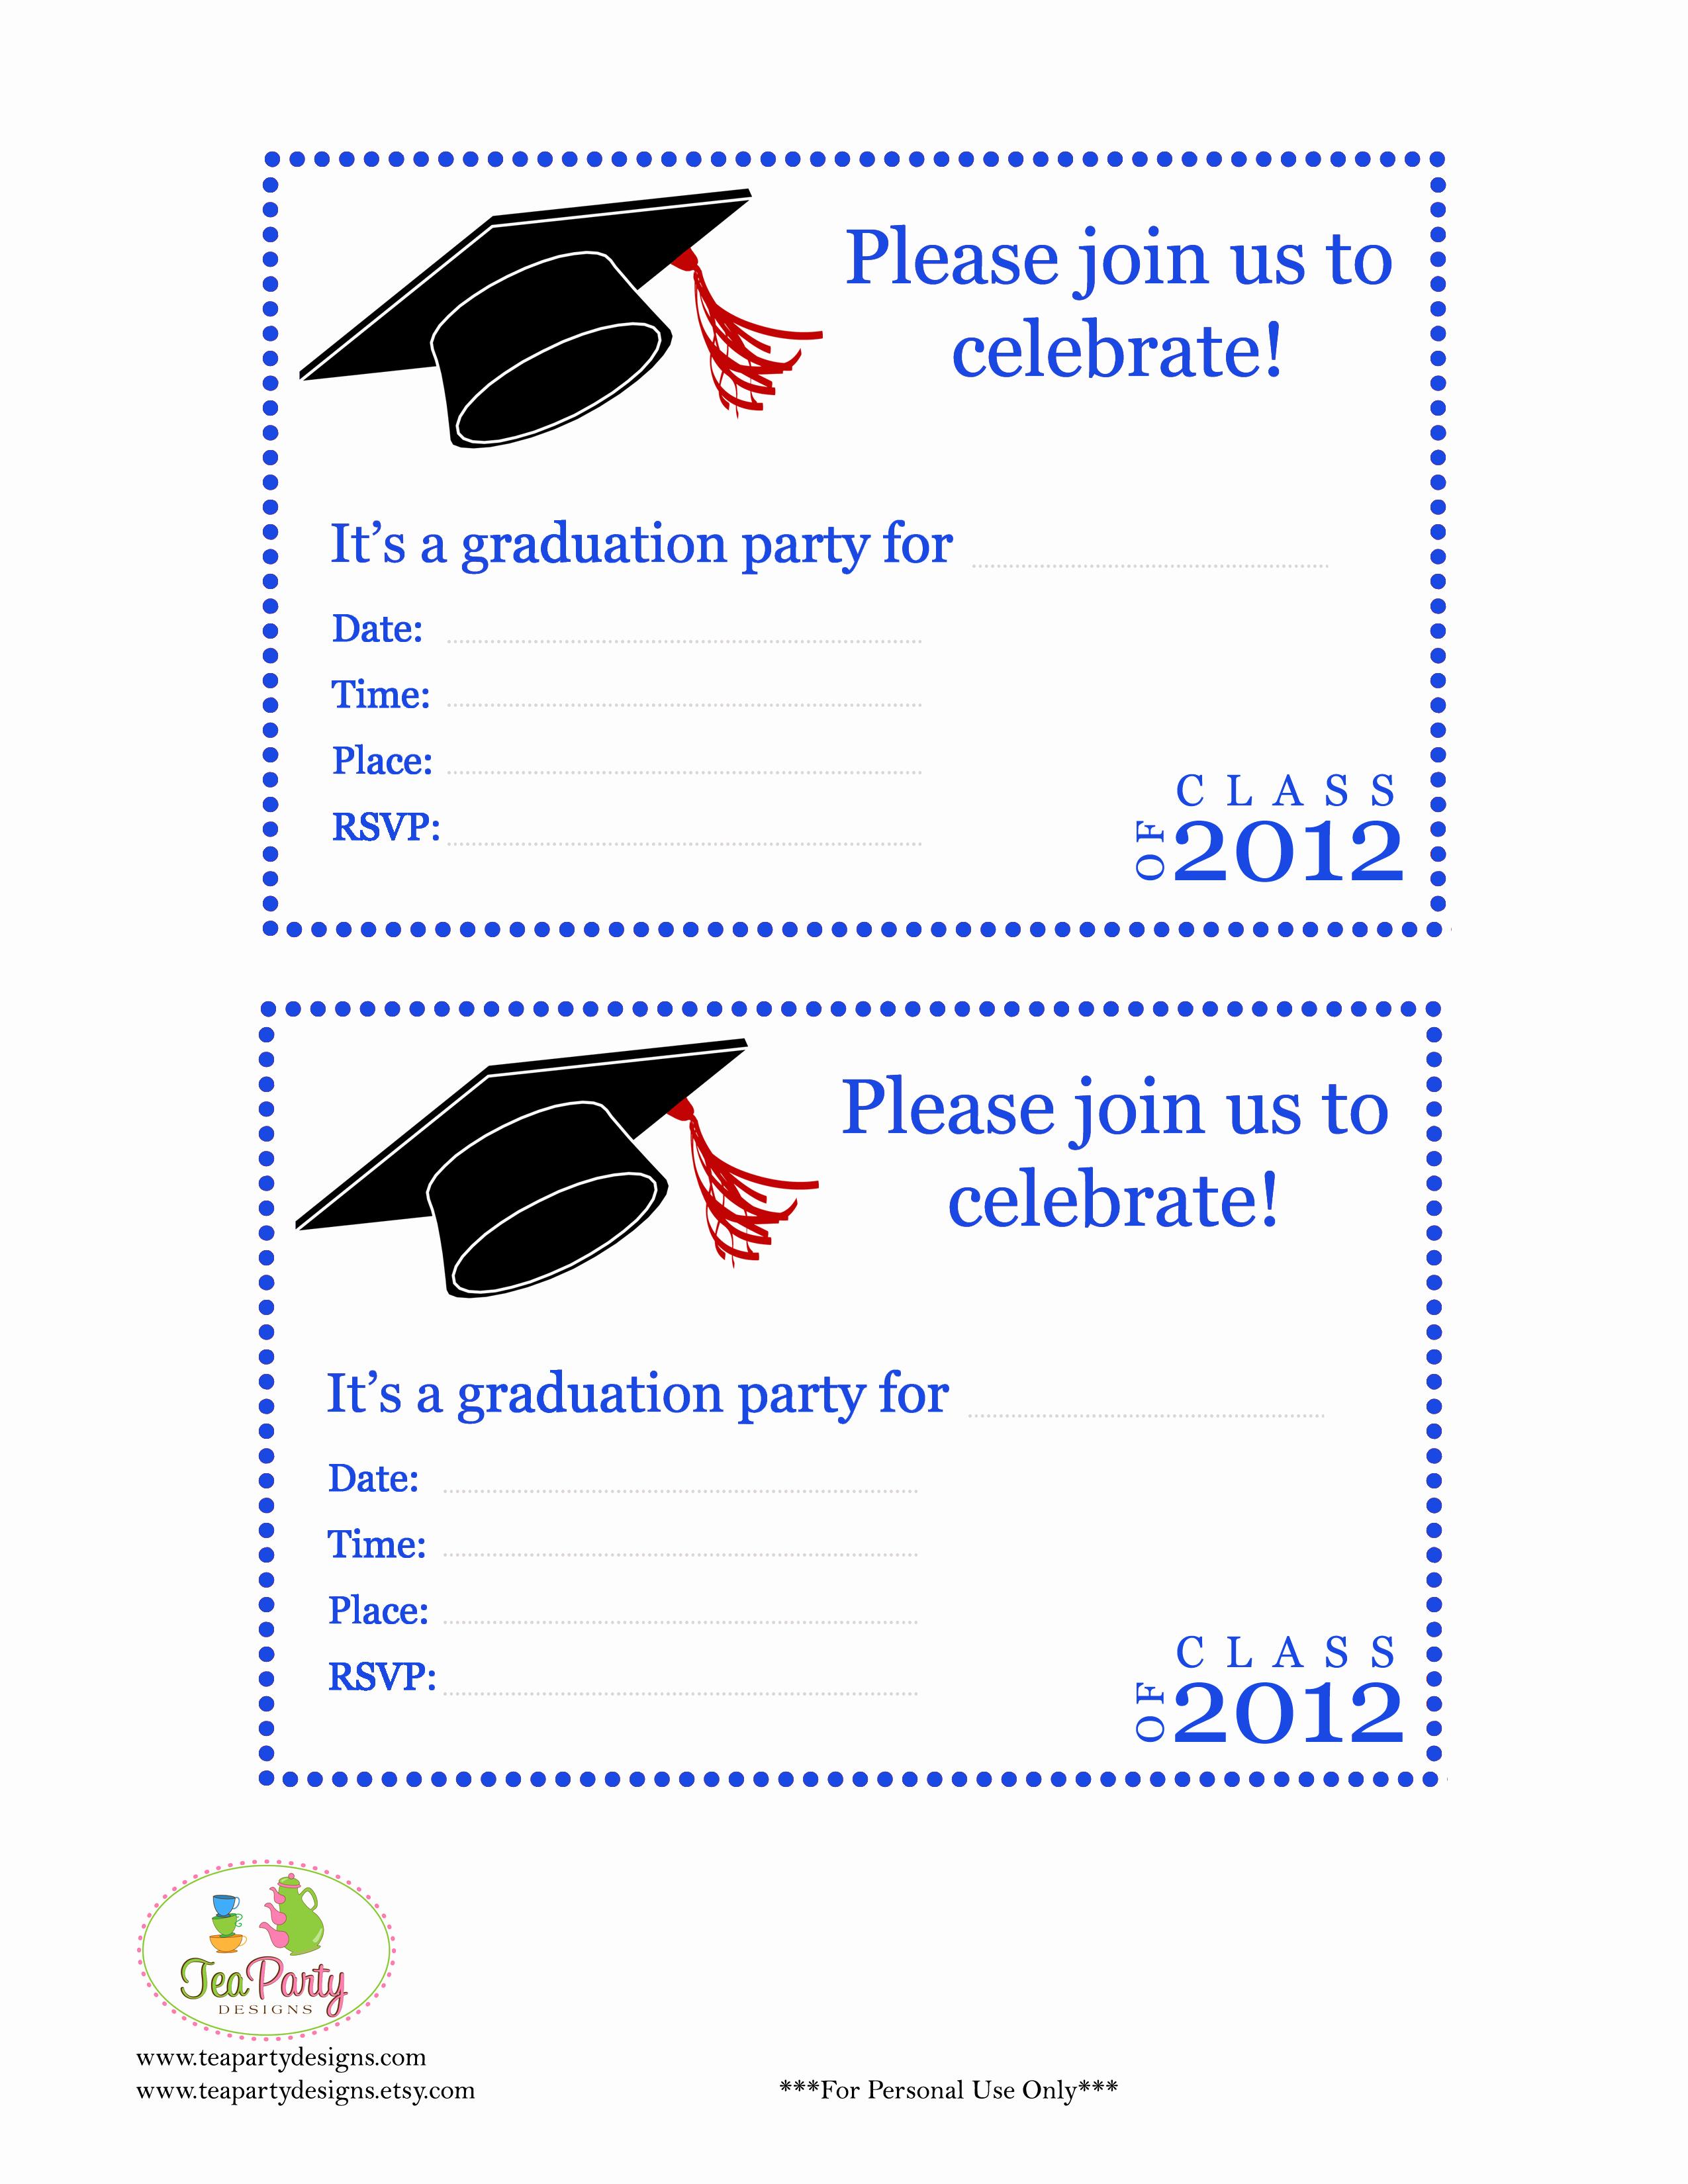 Graduation Announcement Vs Invitation Best Of Free Graduation Party Invitation Templates Graduation